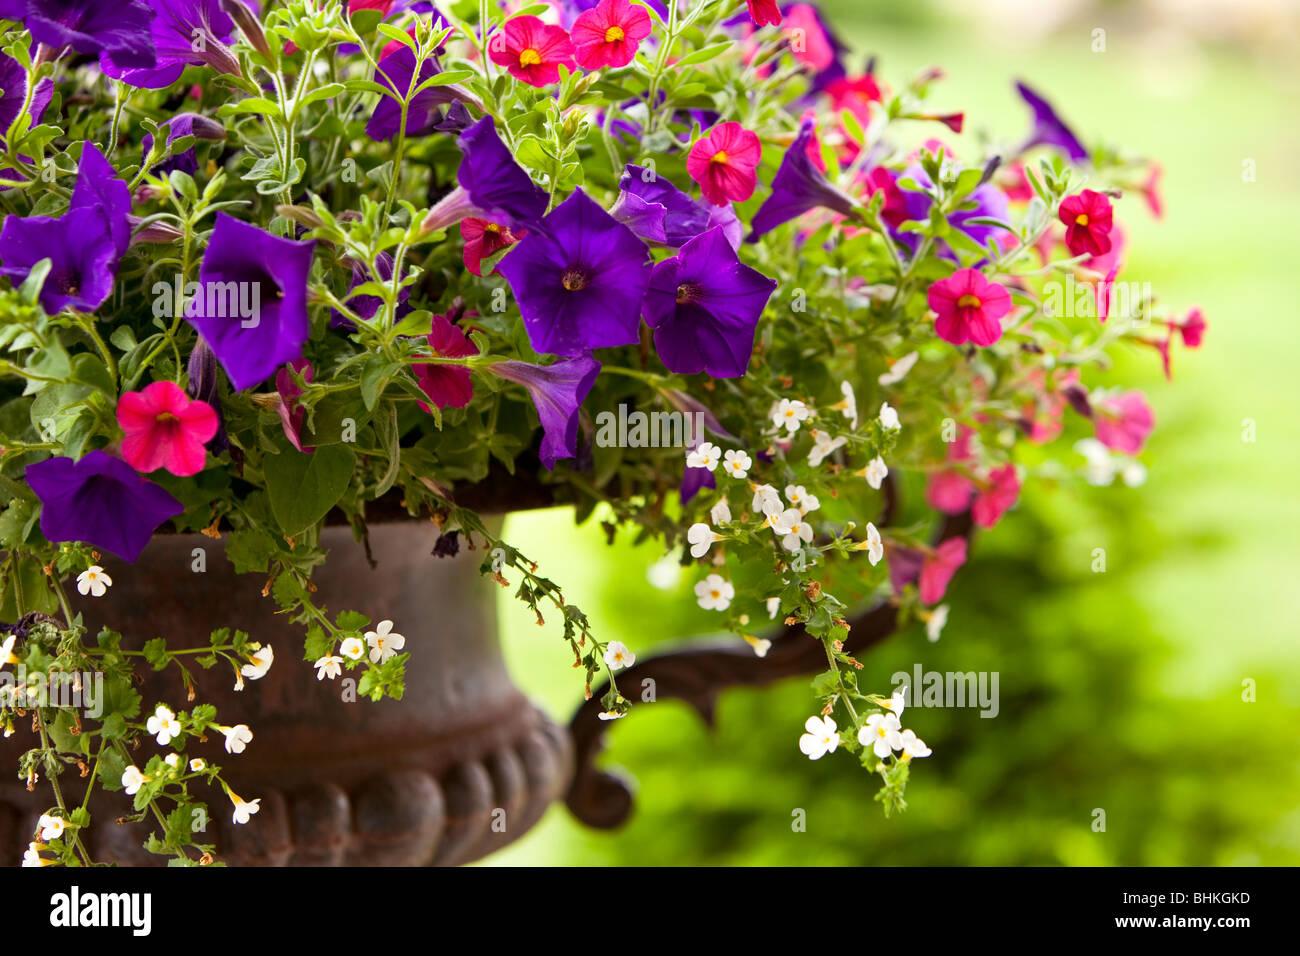 Petunia fleurs dans un pot de fer Photo Stock